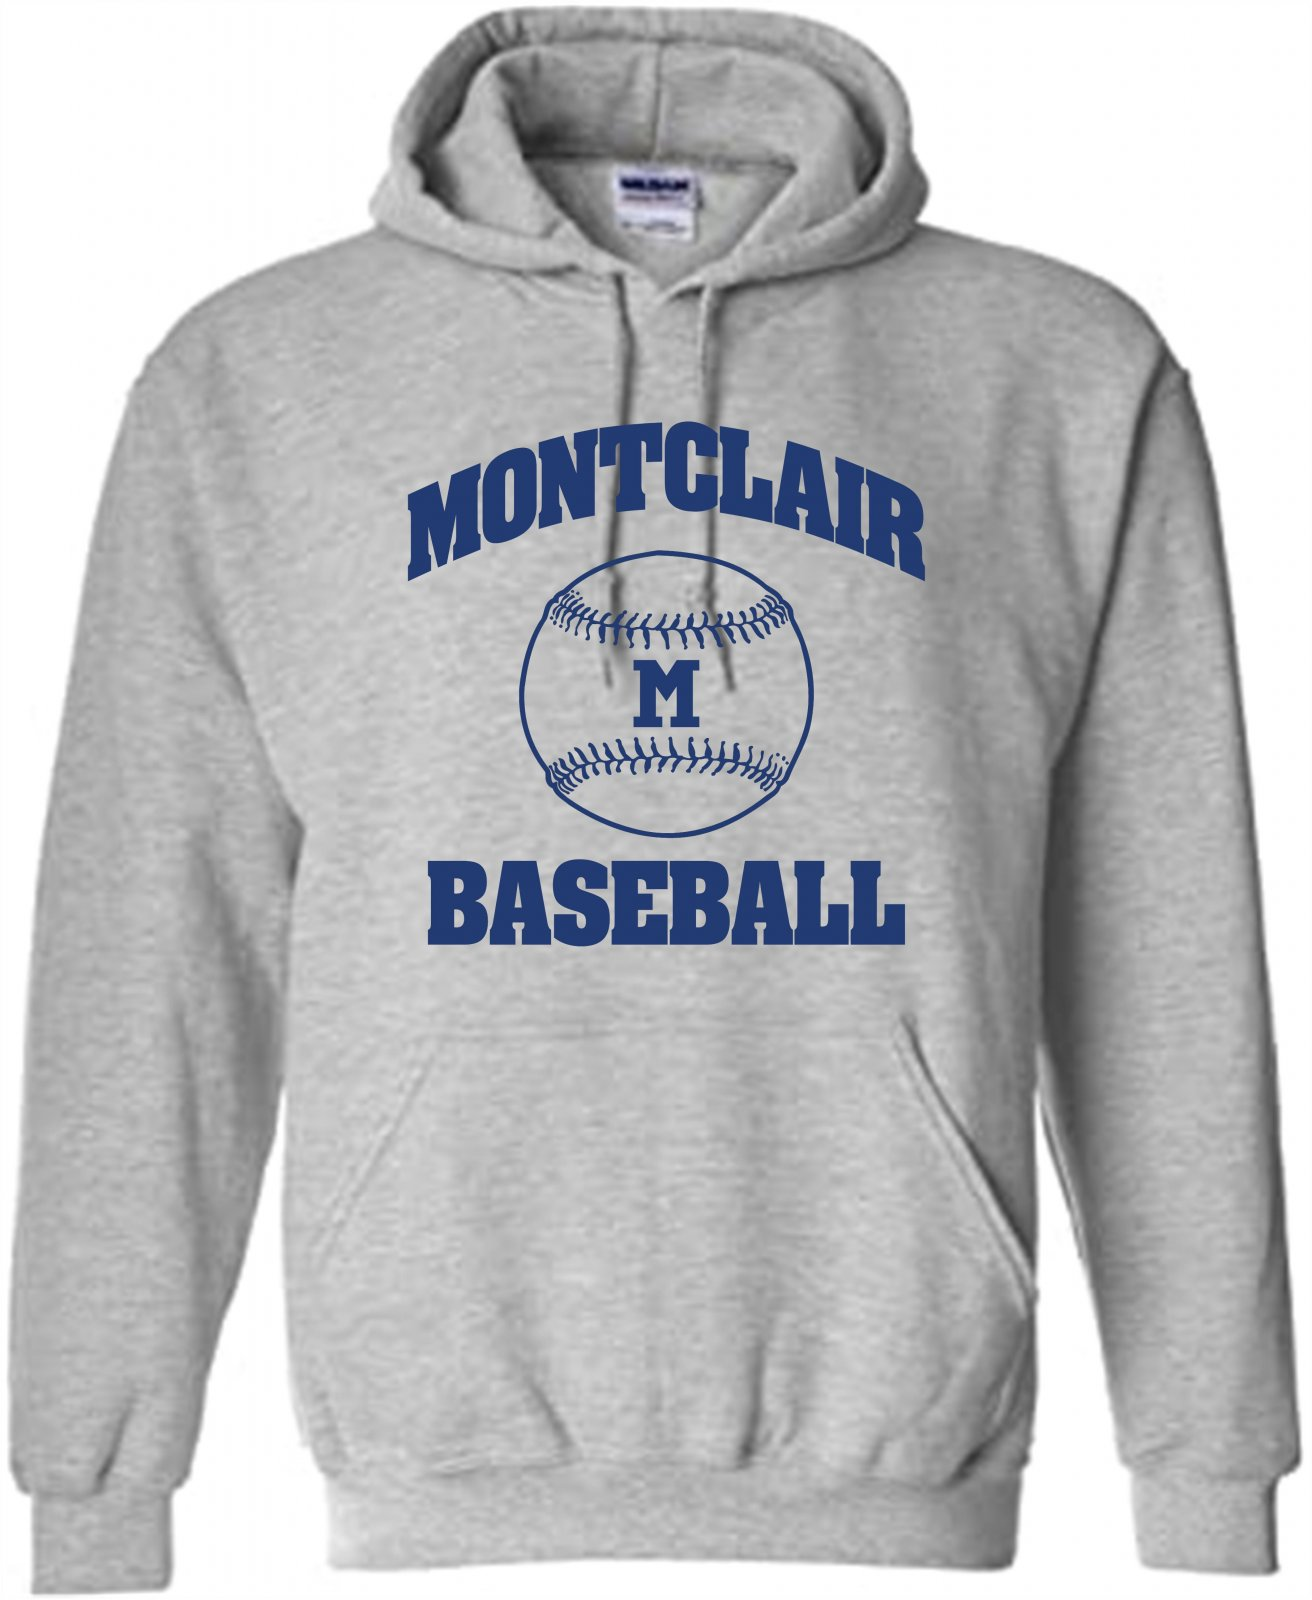 Montclair Softball Hoodie